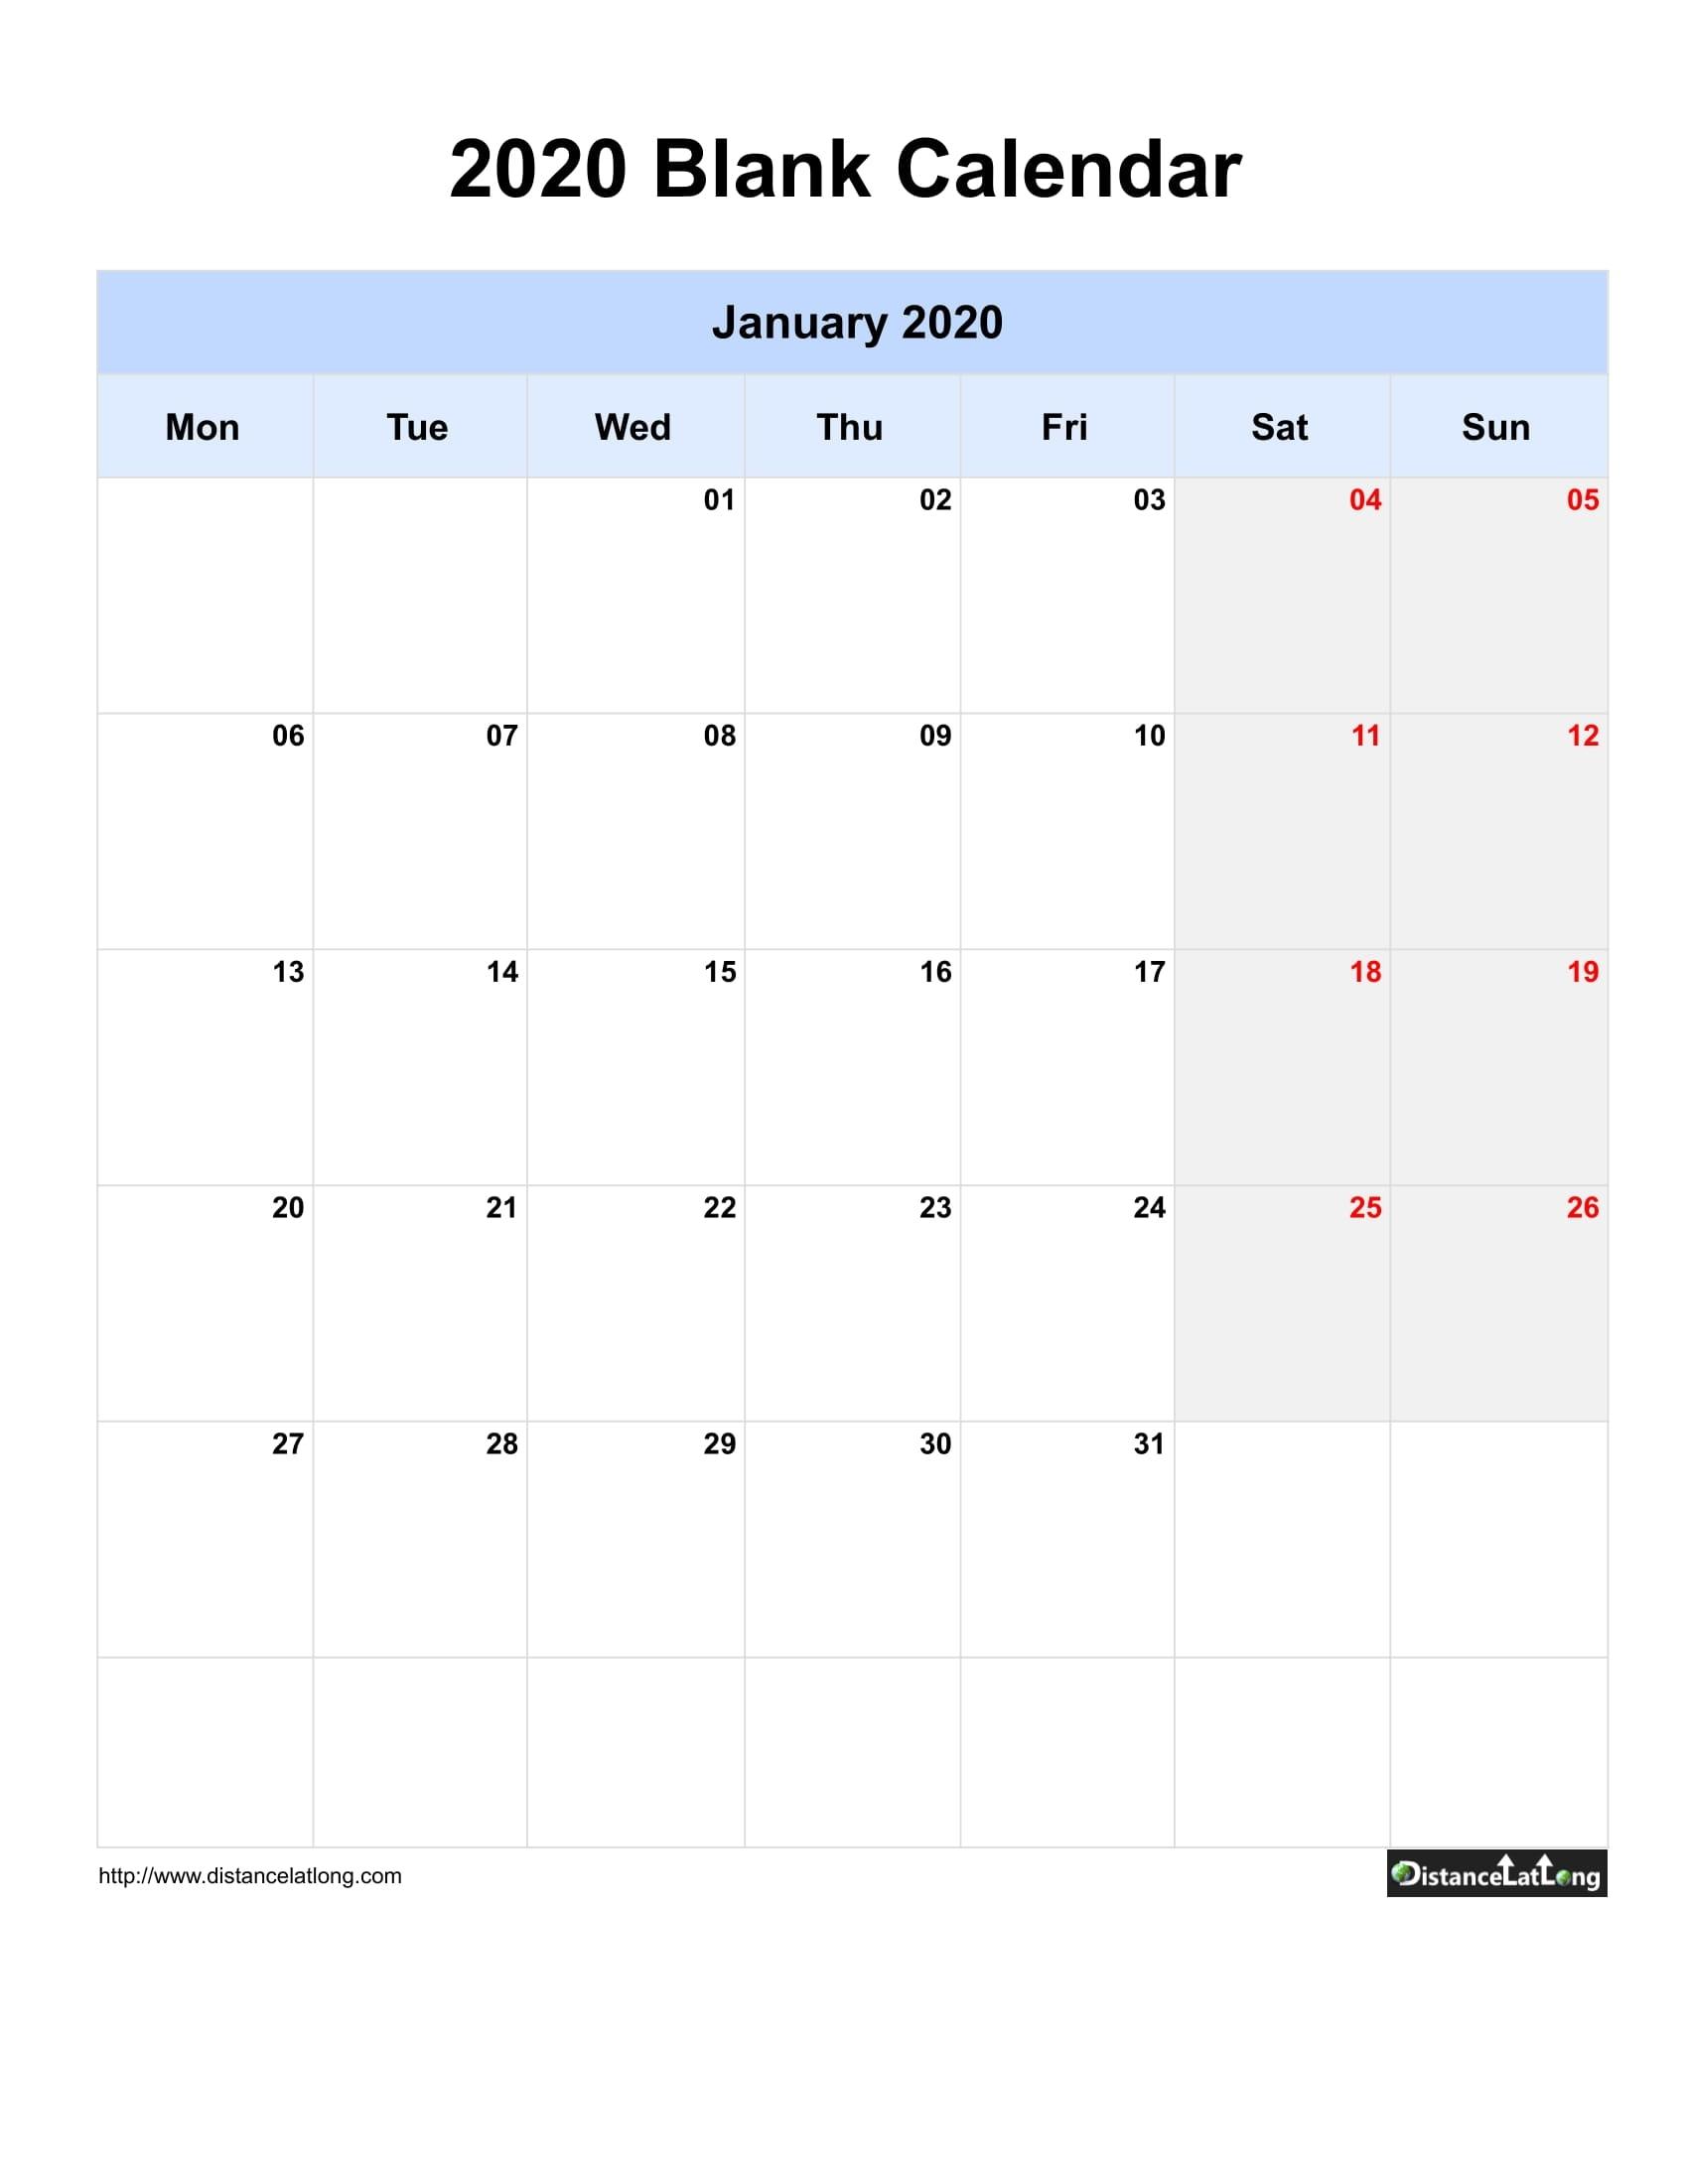 2020 Blank Calendar Blank Portrait Orientation Free in 2020 Calendar Format Monday Through Friday Week